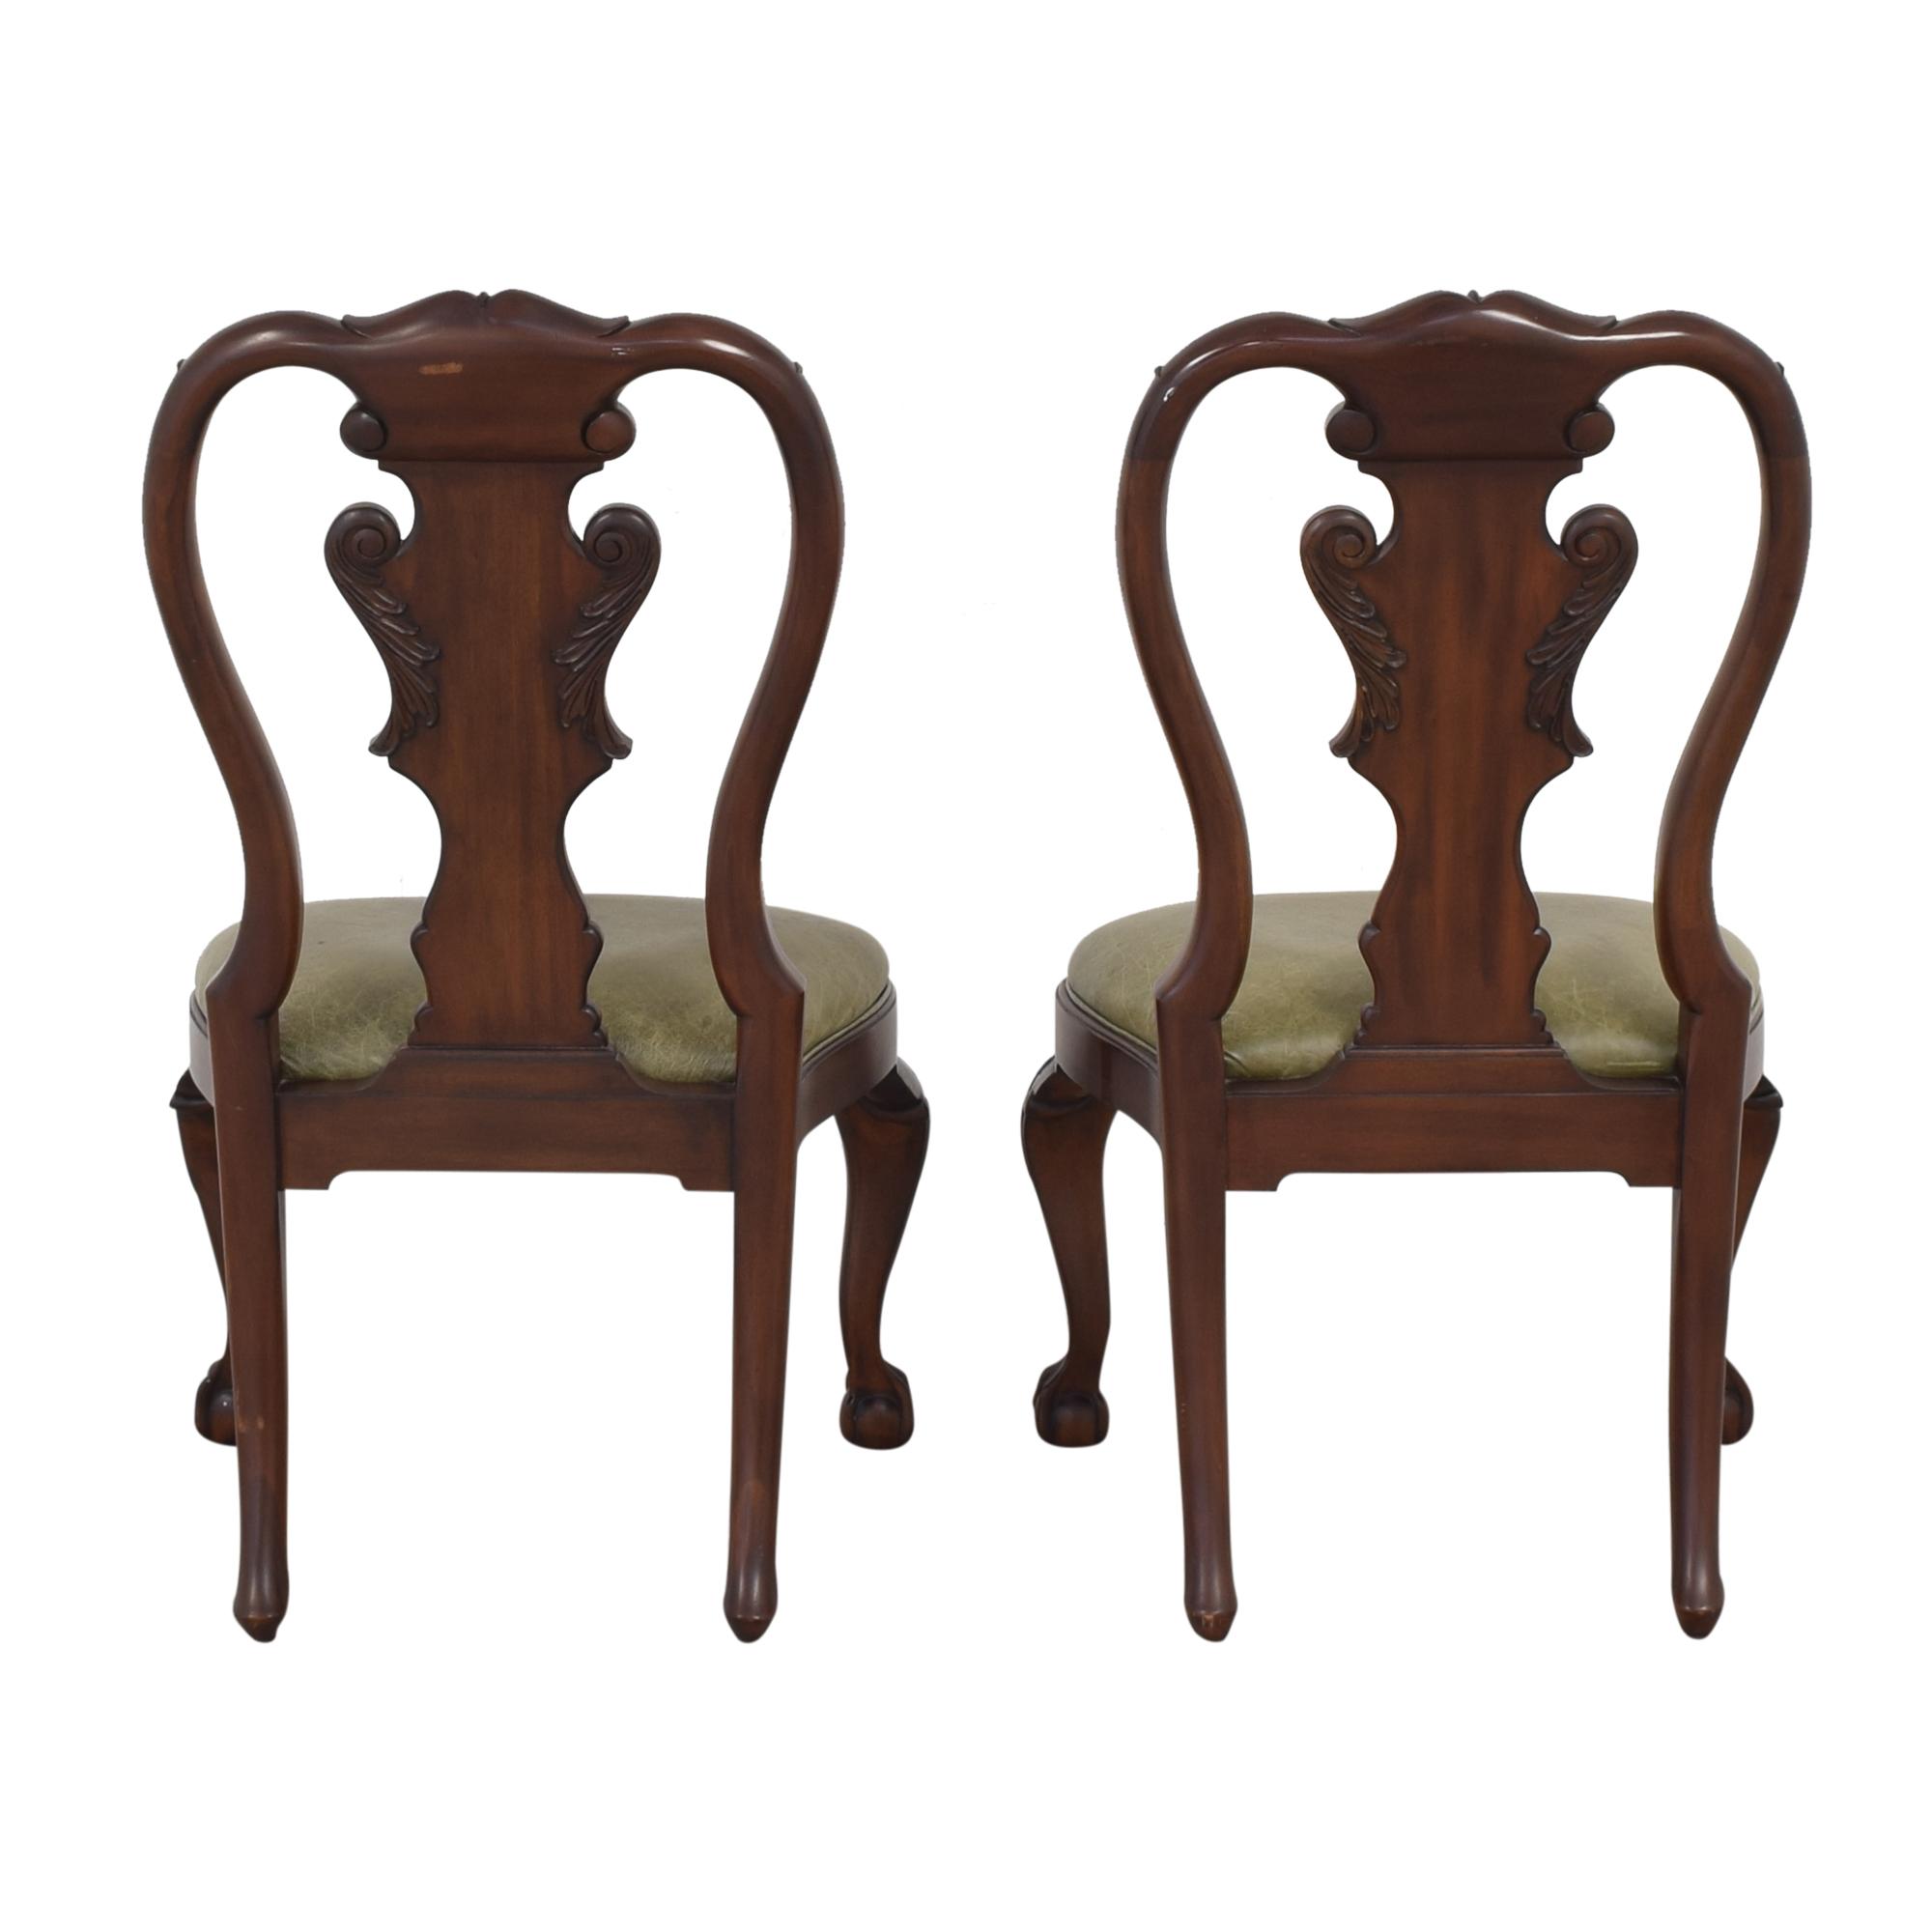 Ethan Allen Ethan Allen Queen Anne Side Dining Chairs